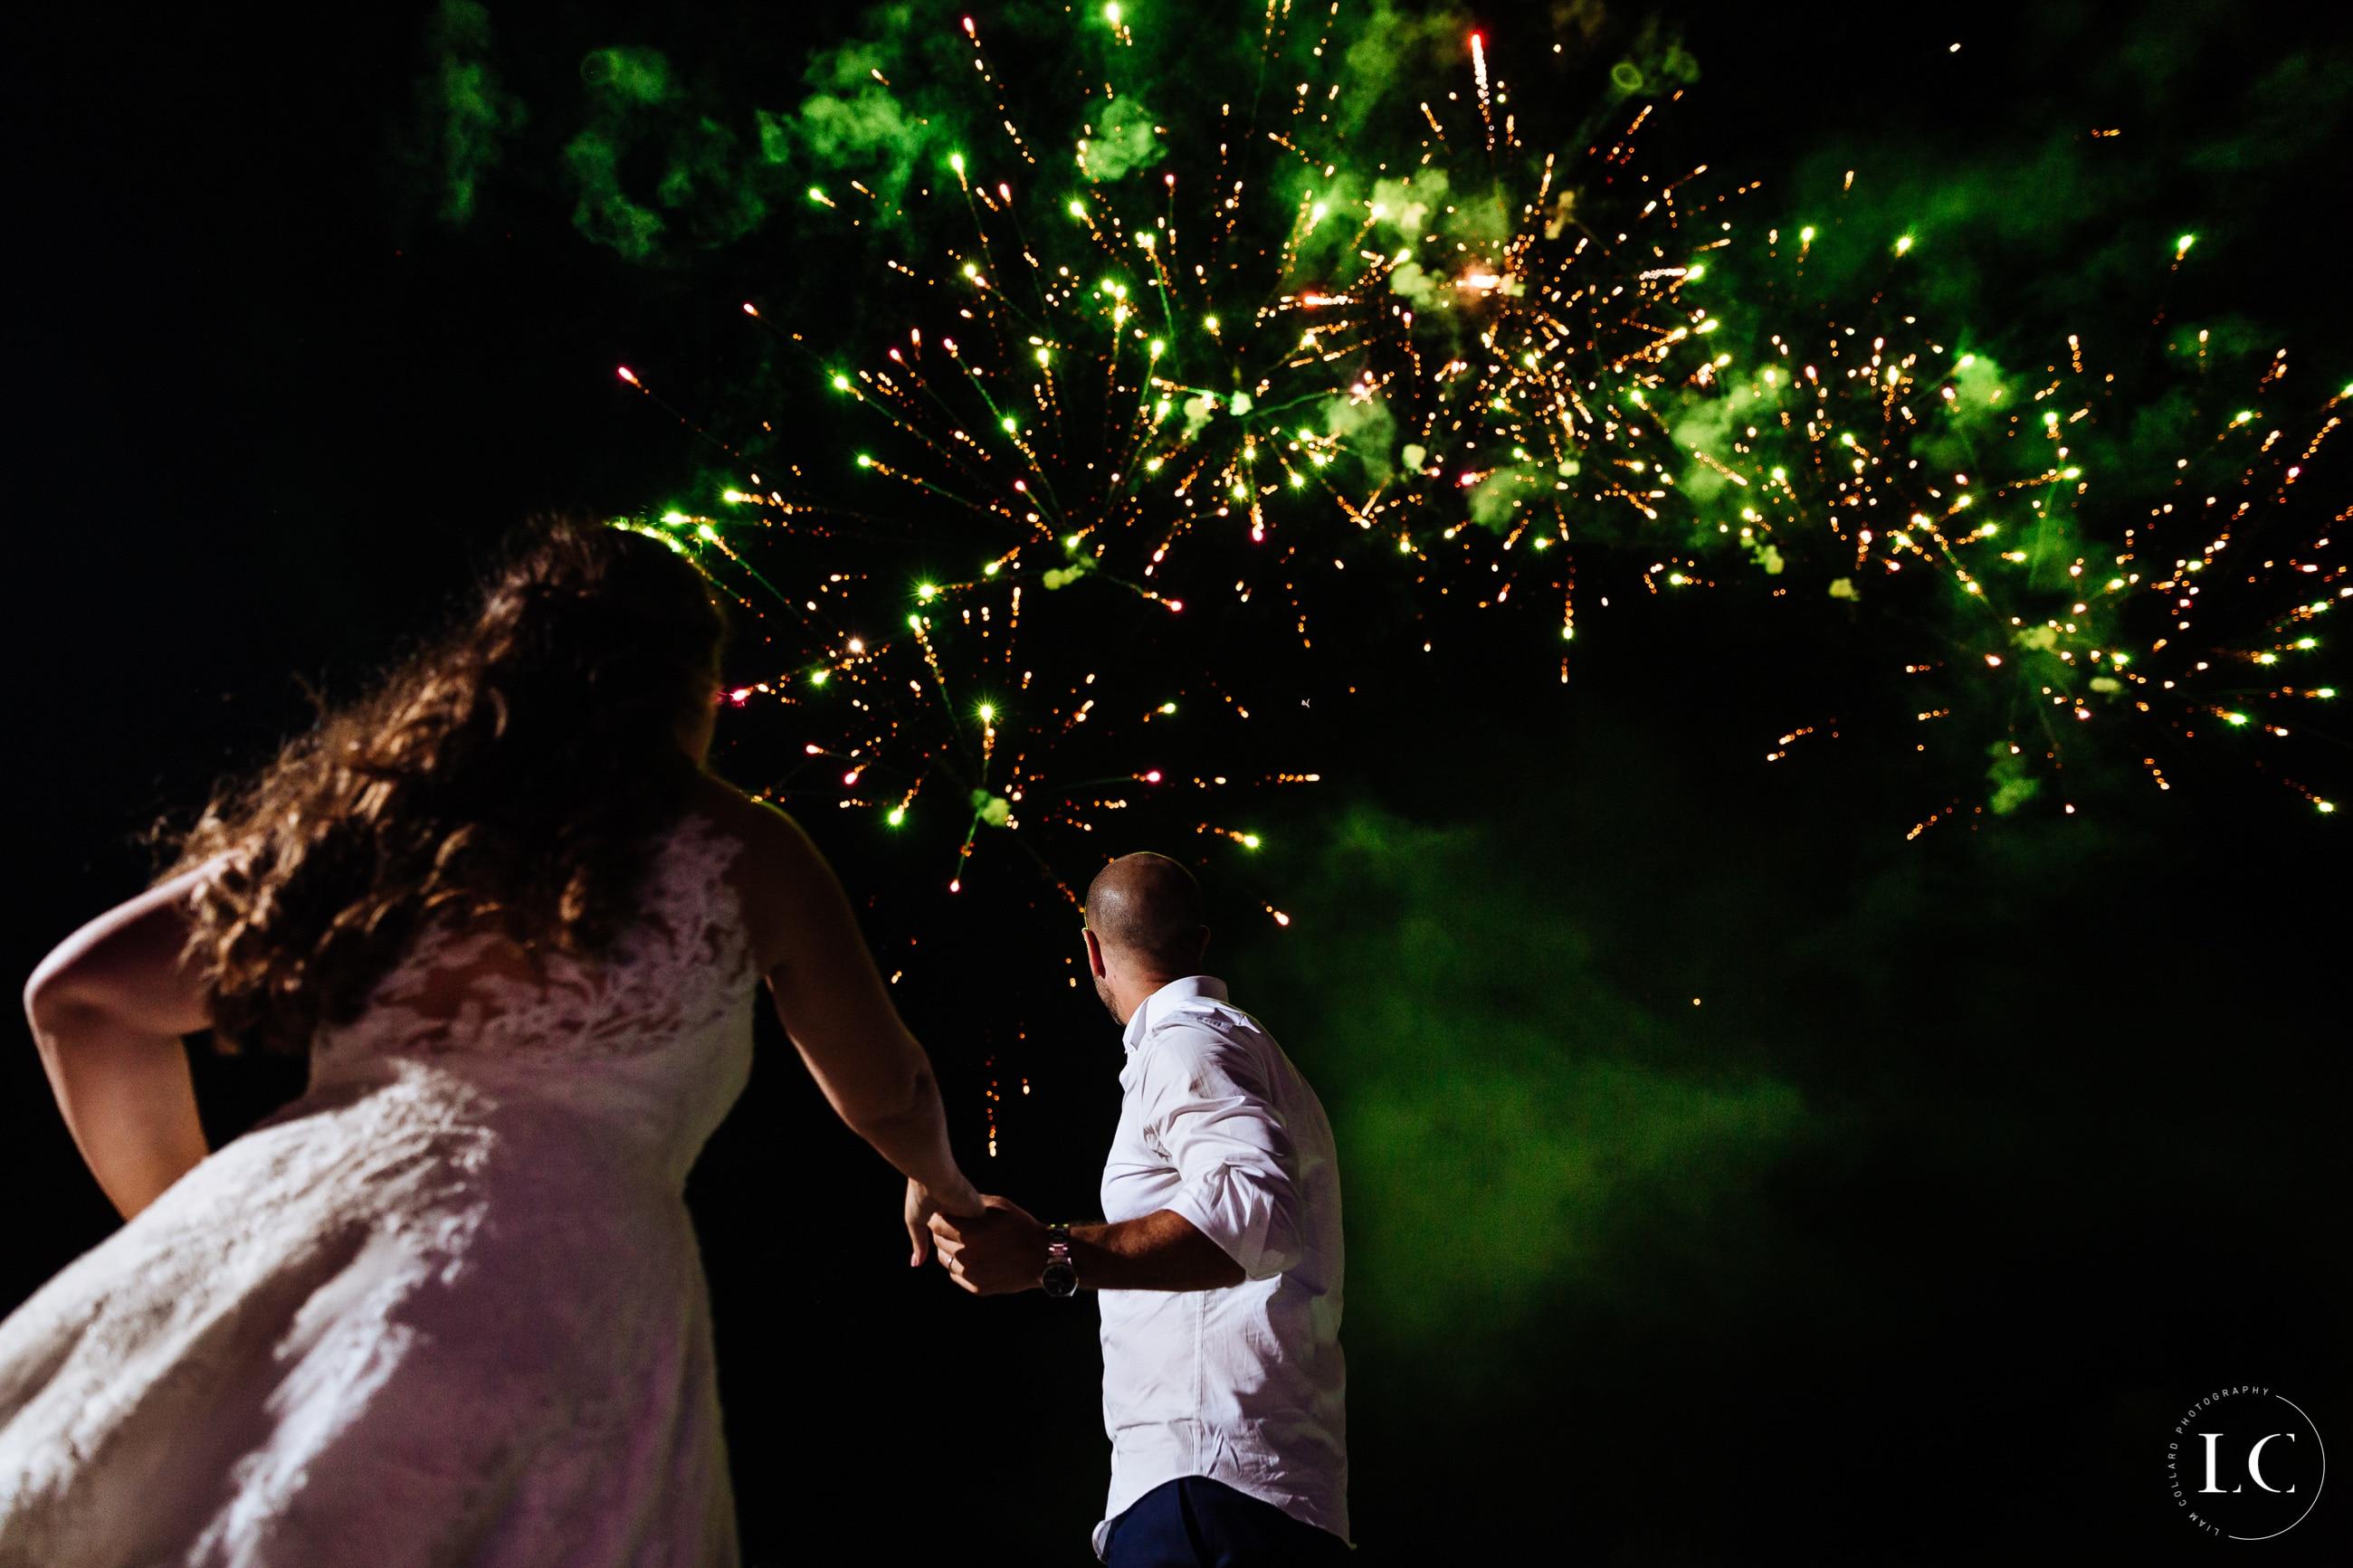 hotography Destination wedding in Greece